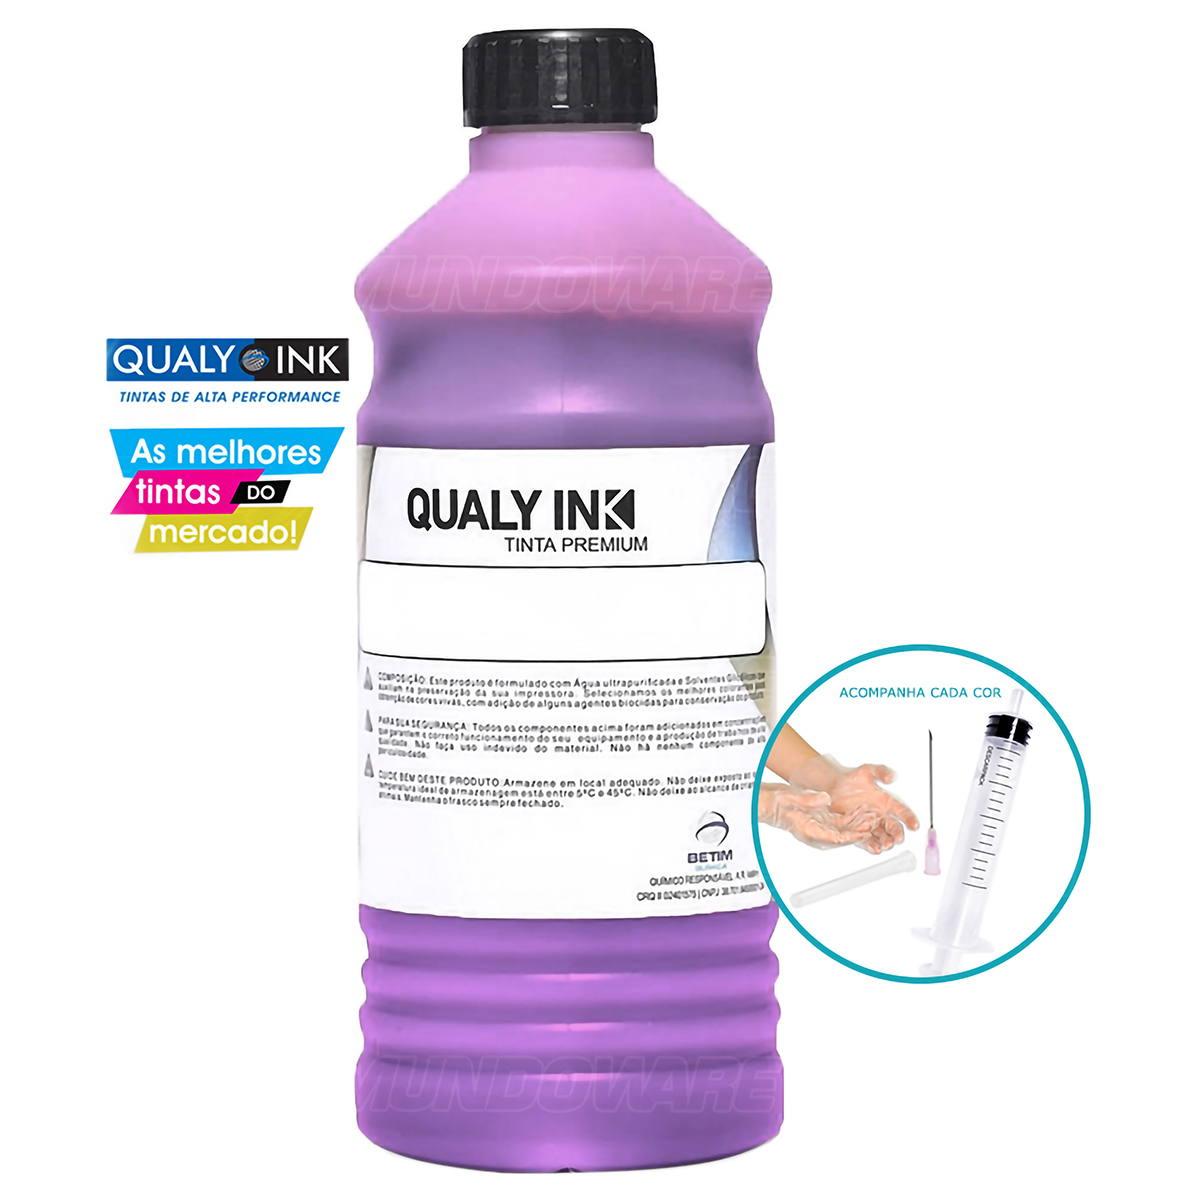 Tinta Corante Qualy-Ink para Impressora Brother DCP-T300 DCP-T500w DCP-T700w MFC-T800w MFC-T910w Magenta Refil 1L